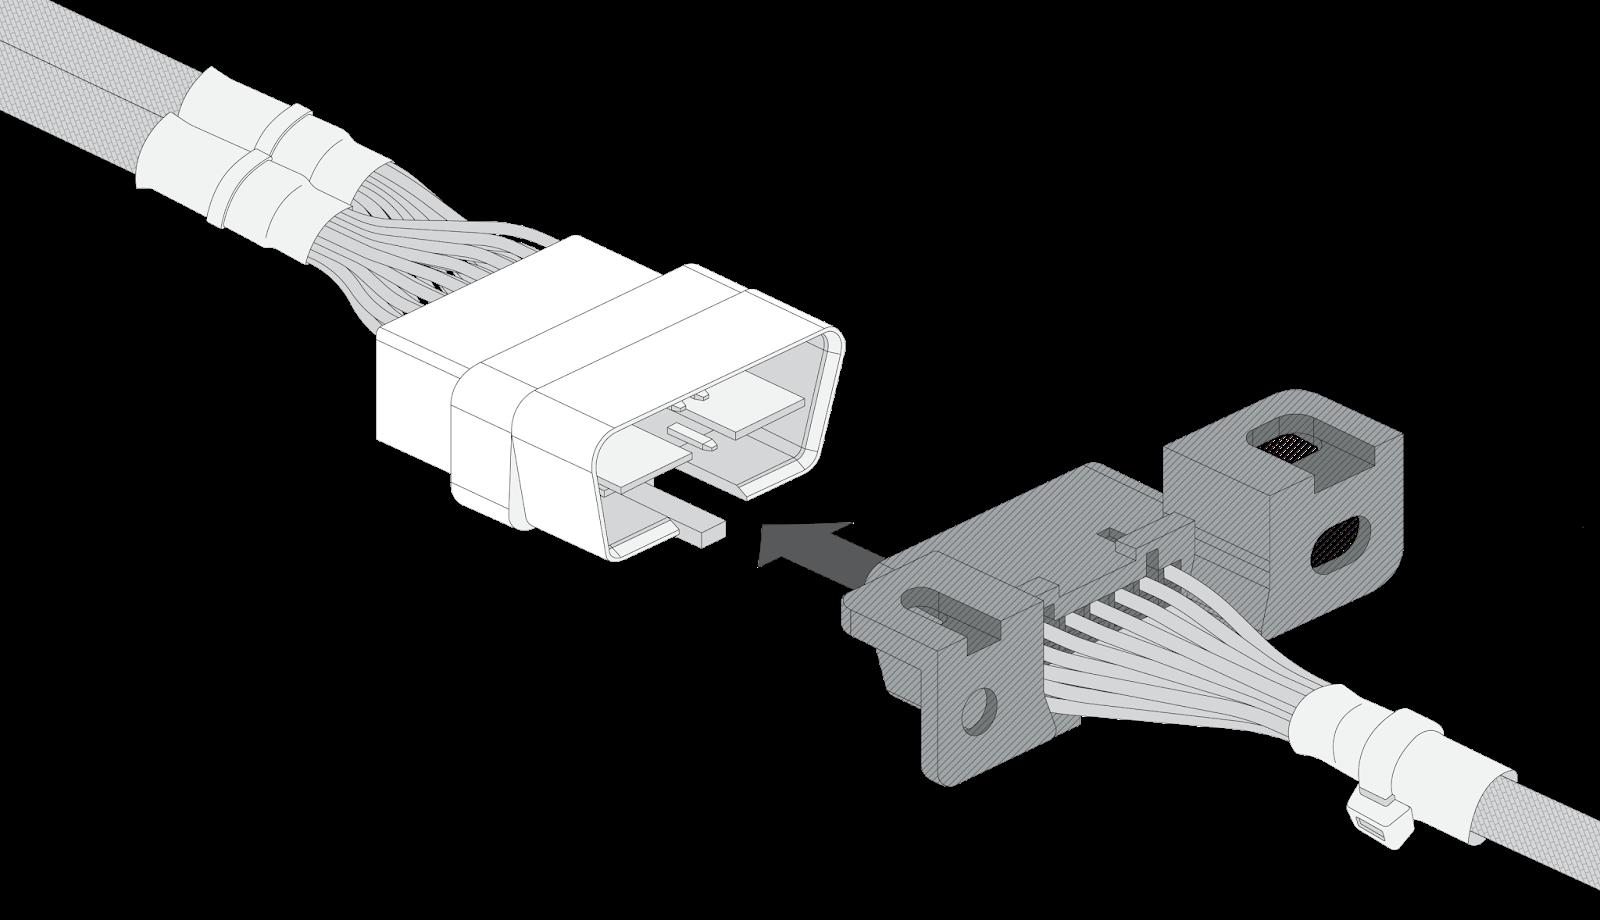 universal-harness-setup-figure4.png